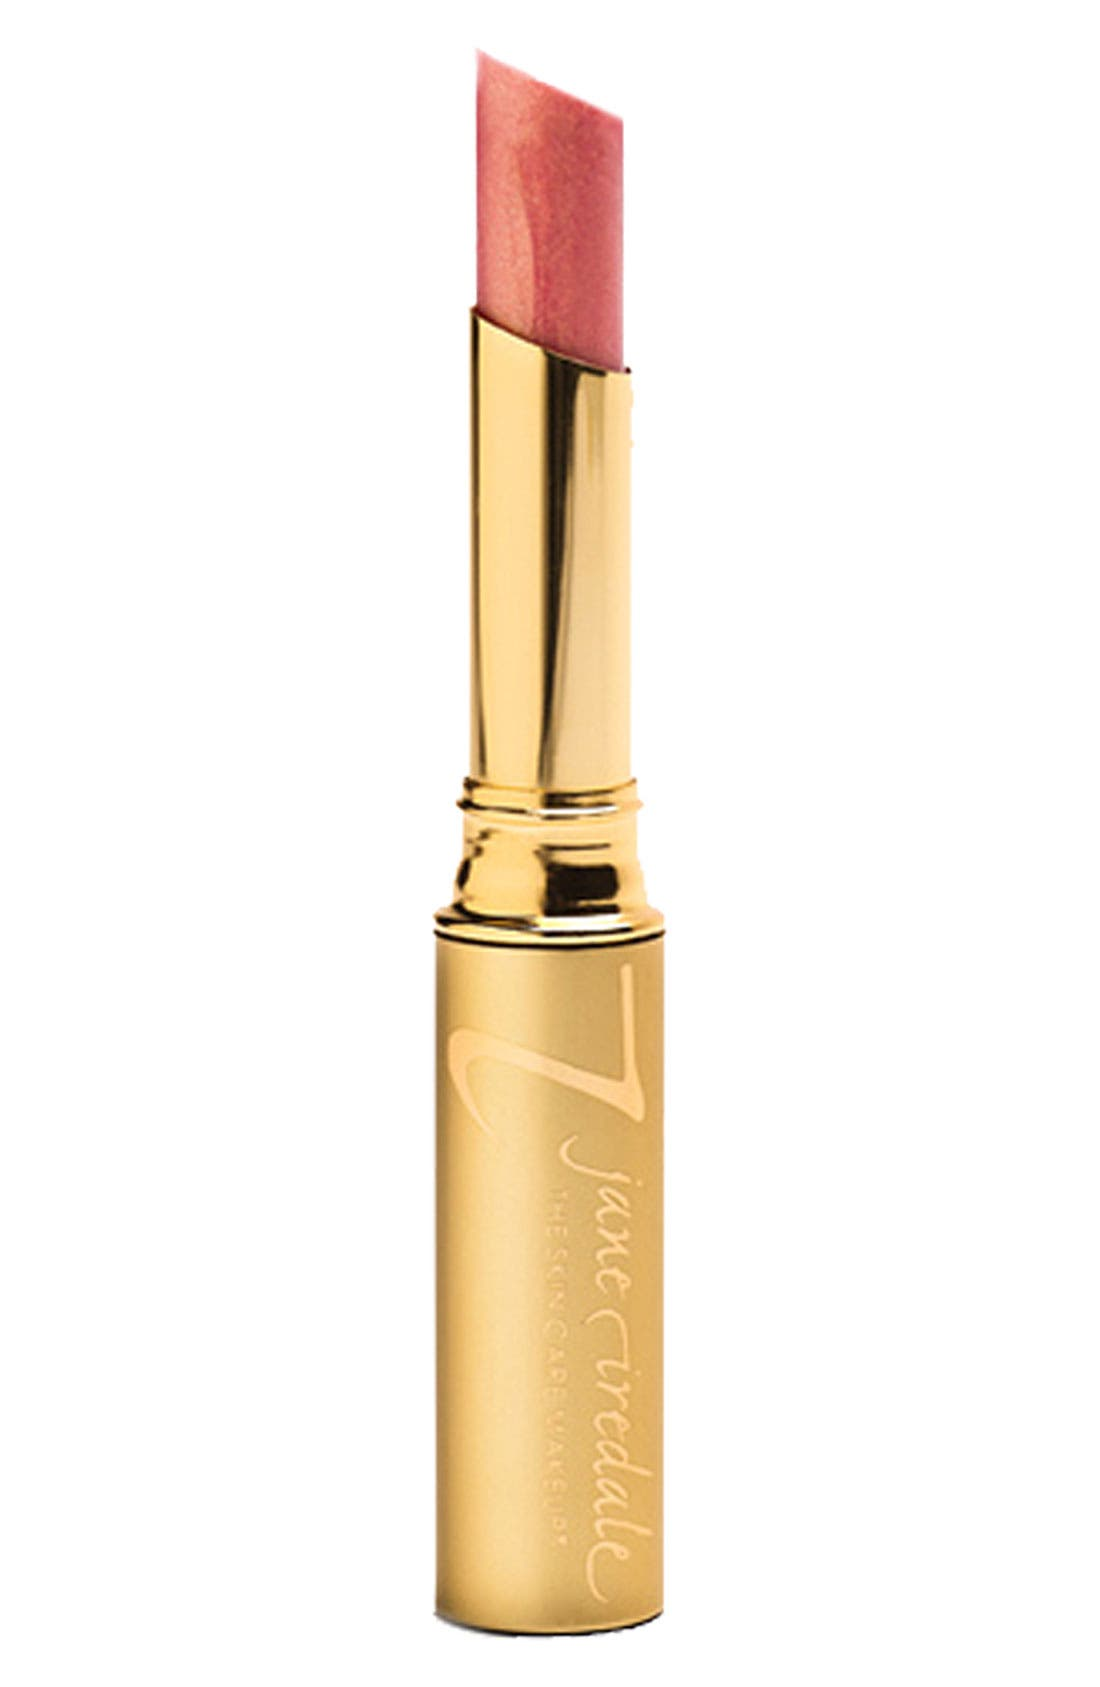 Just Kissed Lip Plumper,                         Main,                         color, 001